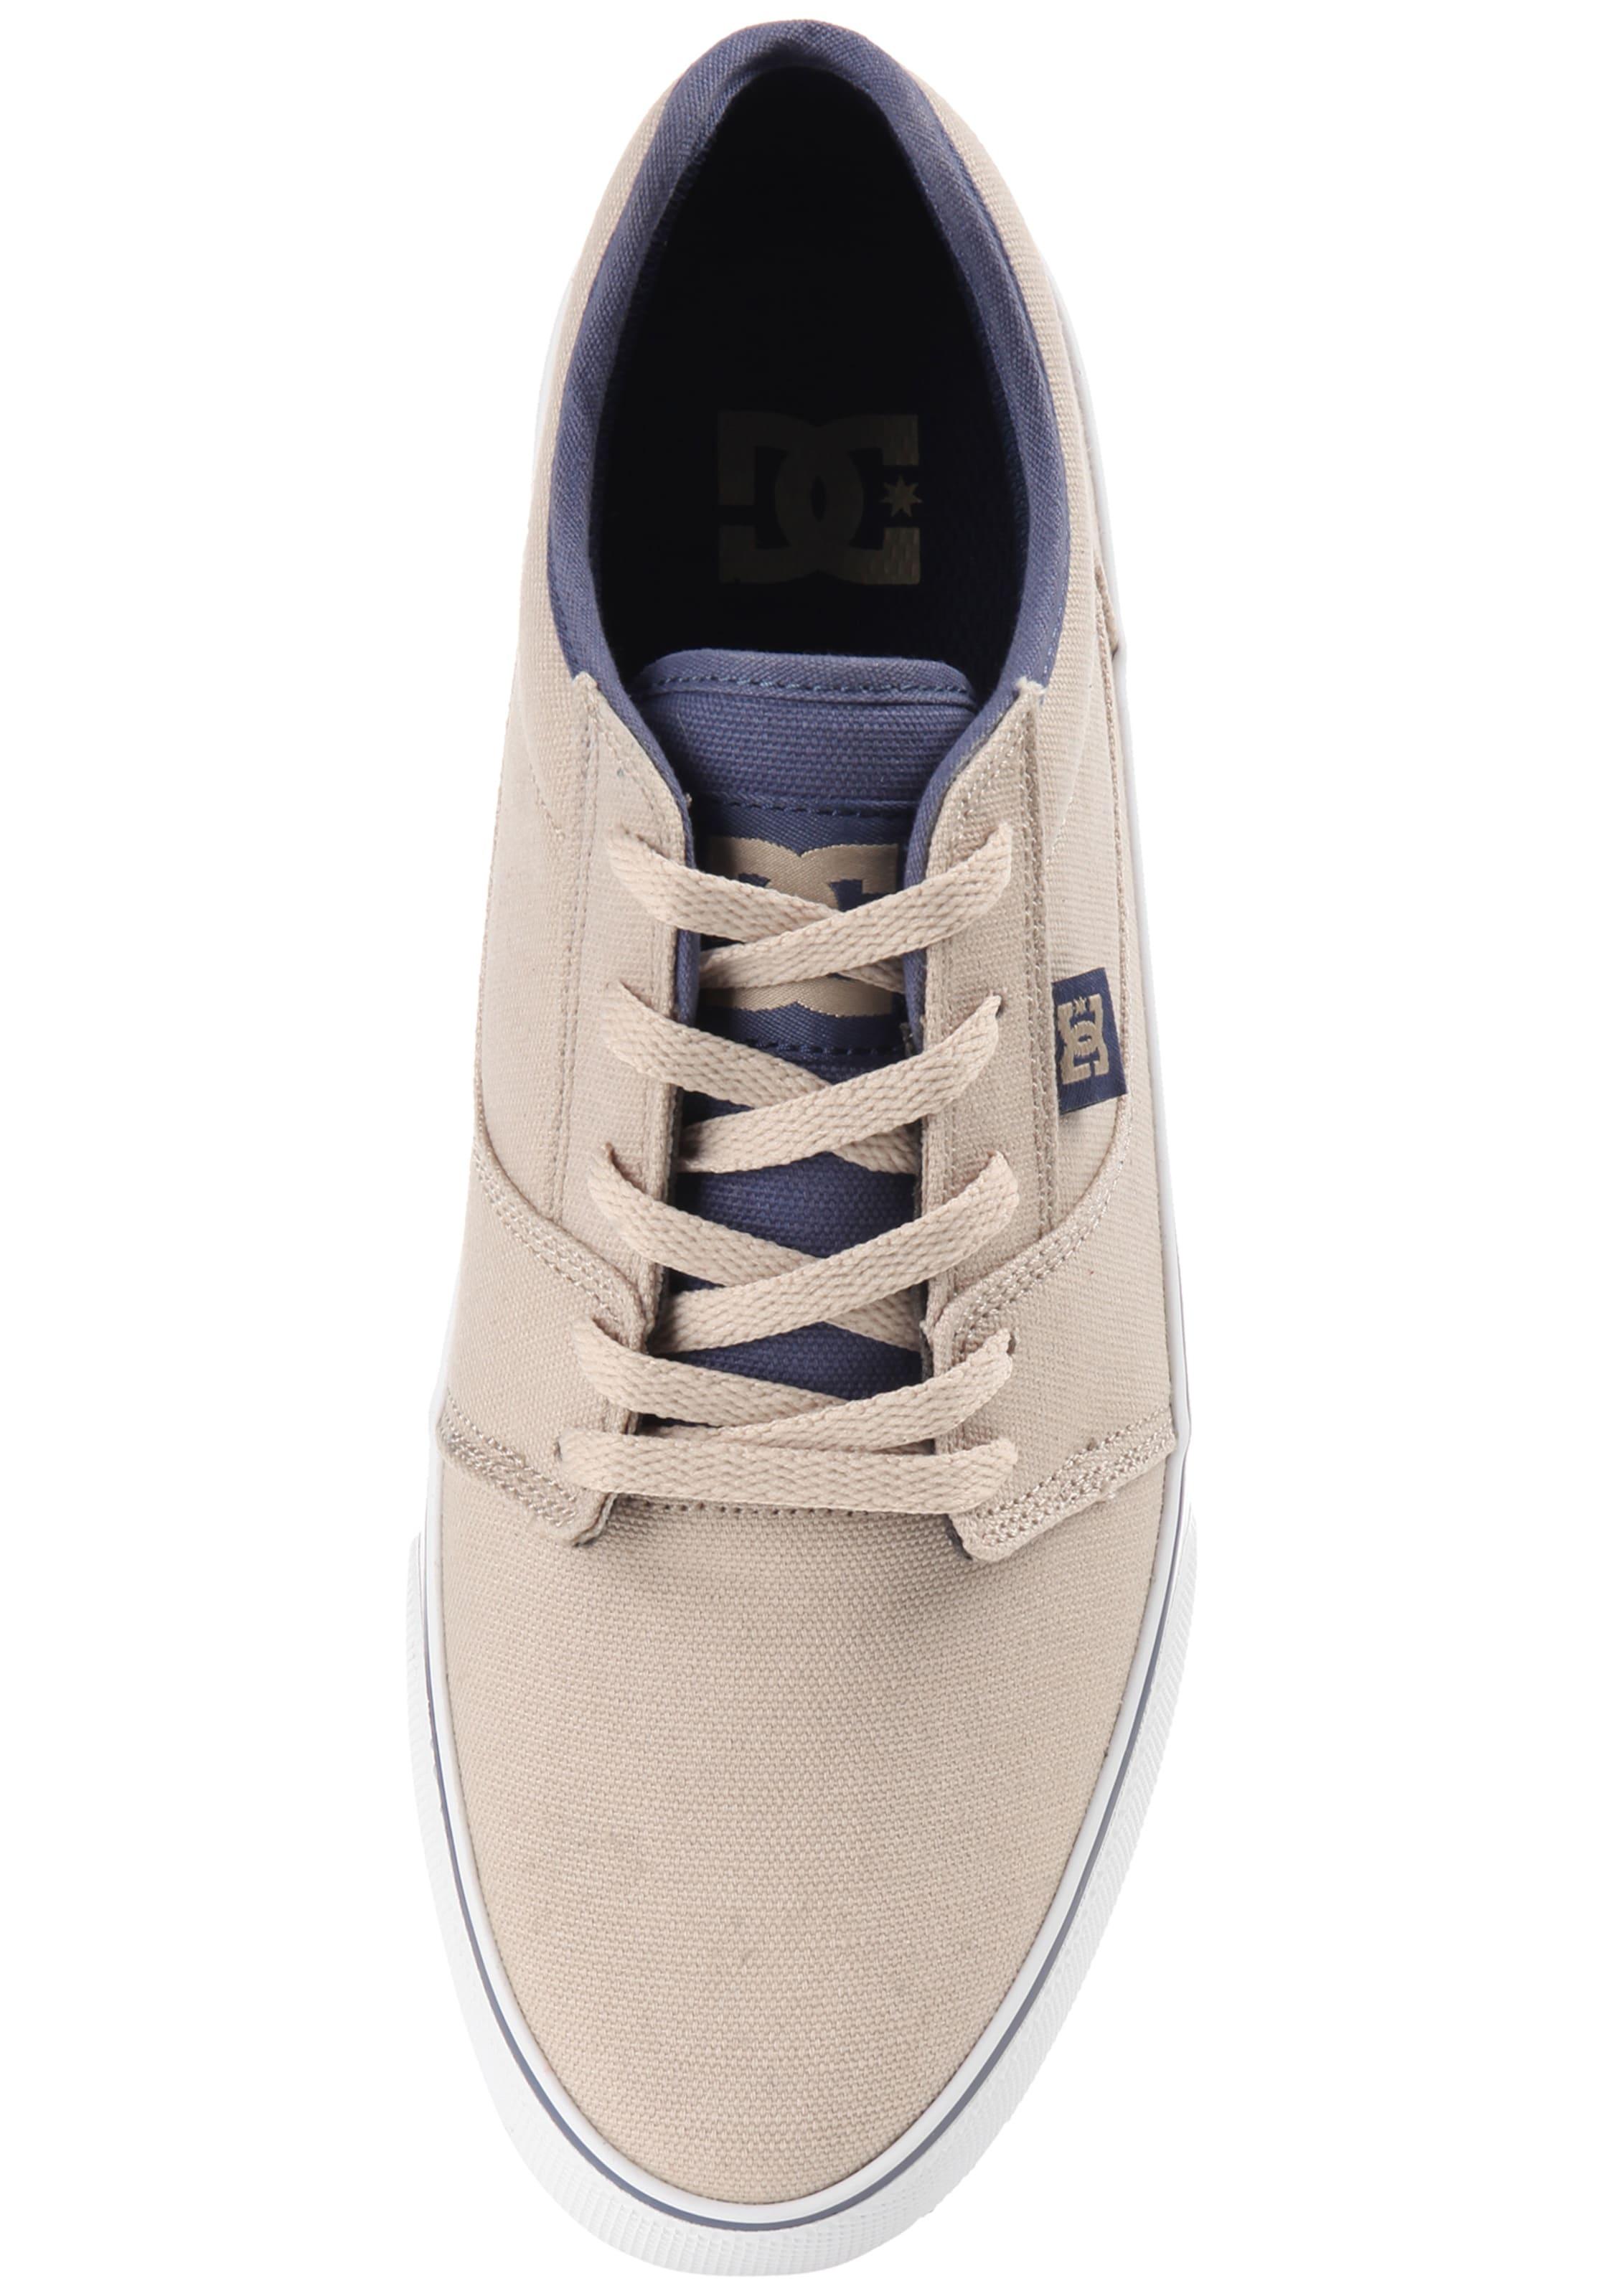 MarineTaupe Shoes Dc In Tx' Sneaker 'tonik Weiß jR4ALc3q5